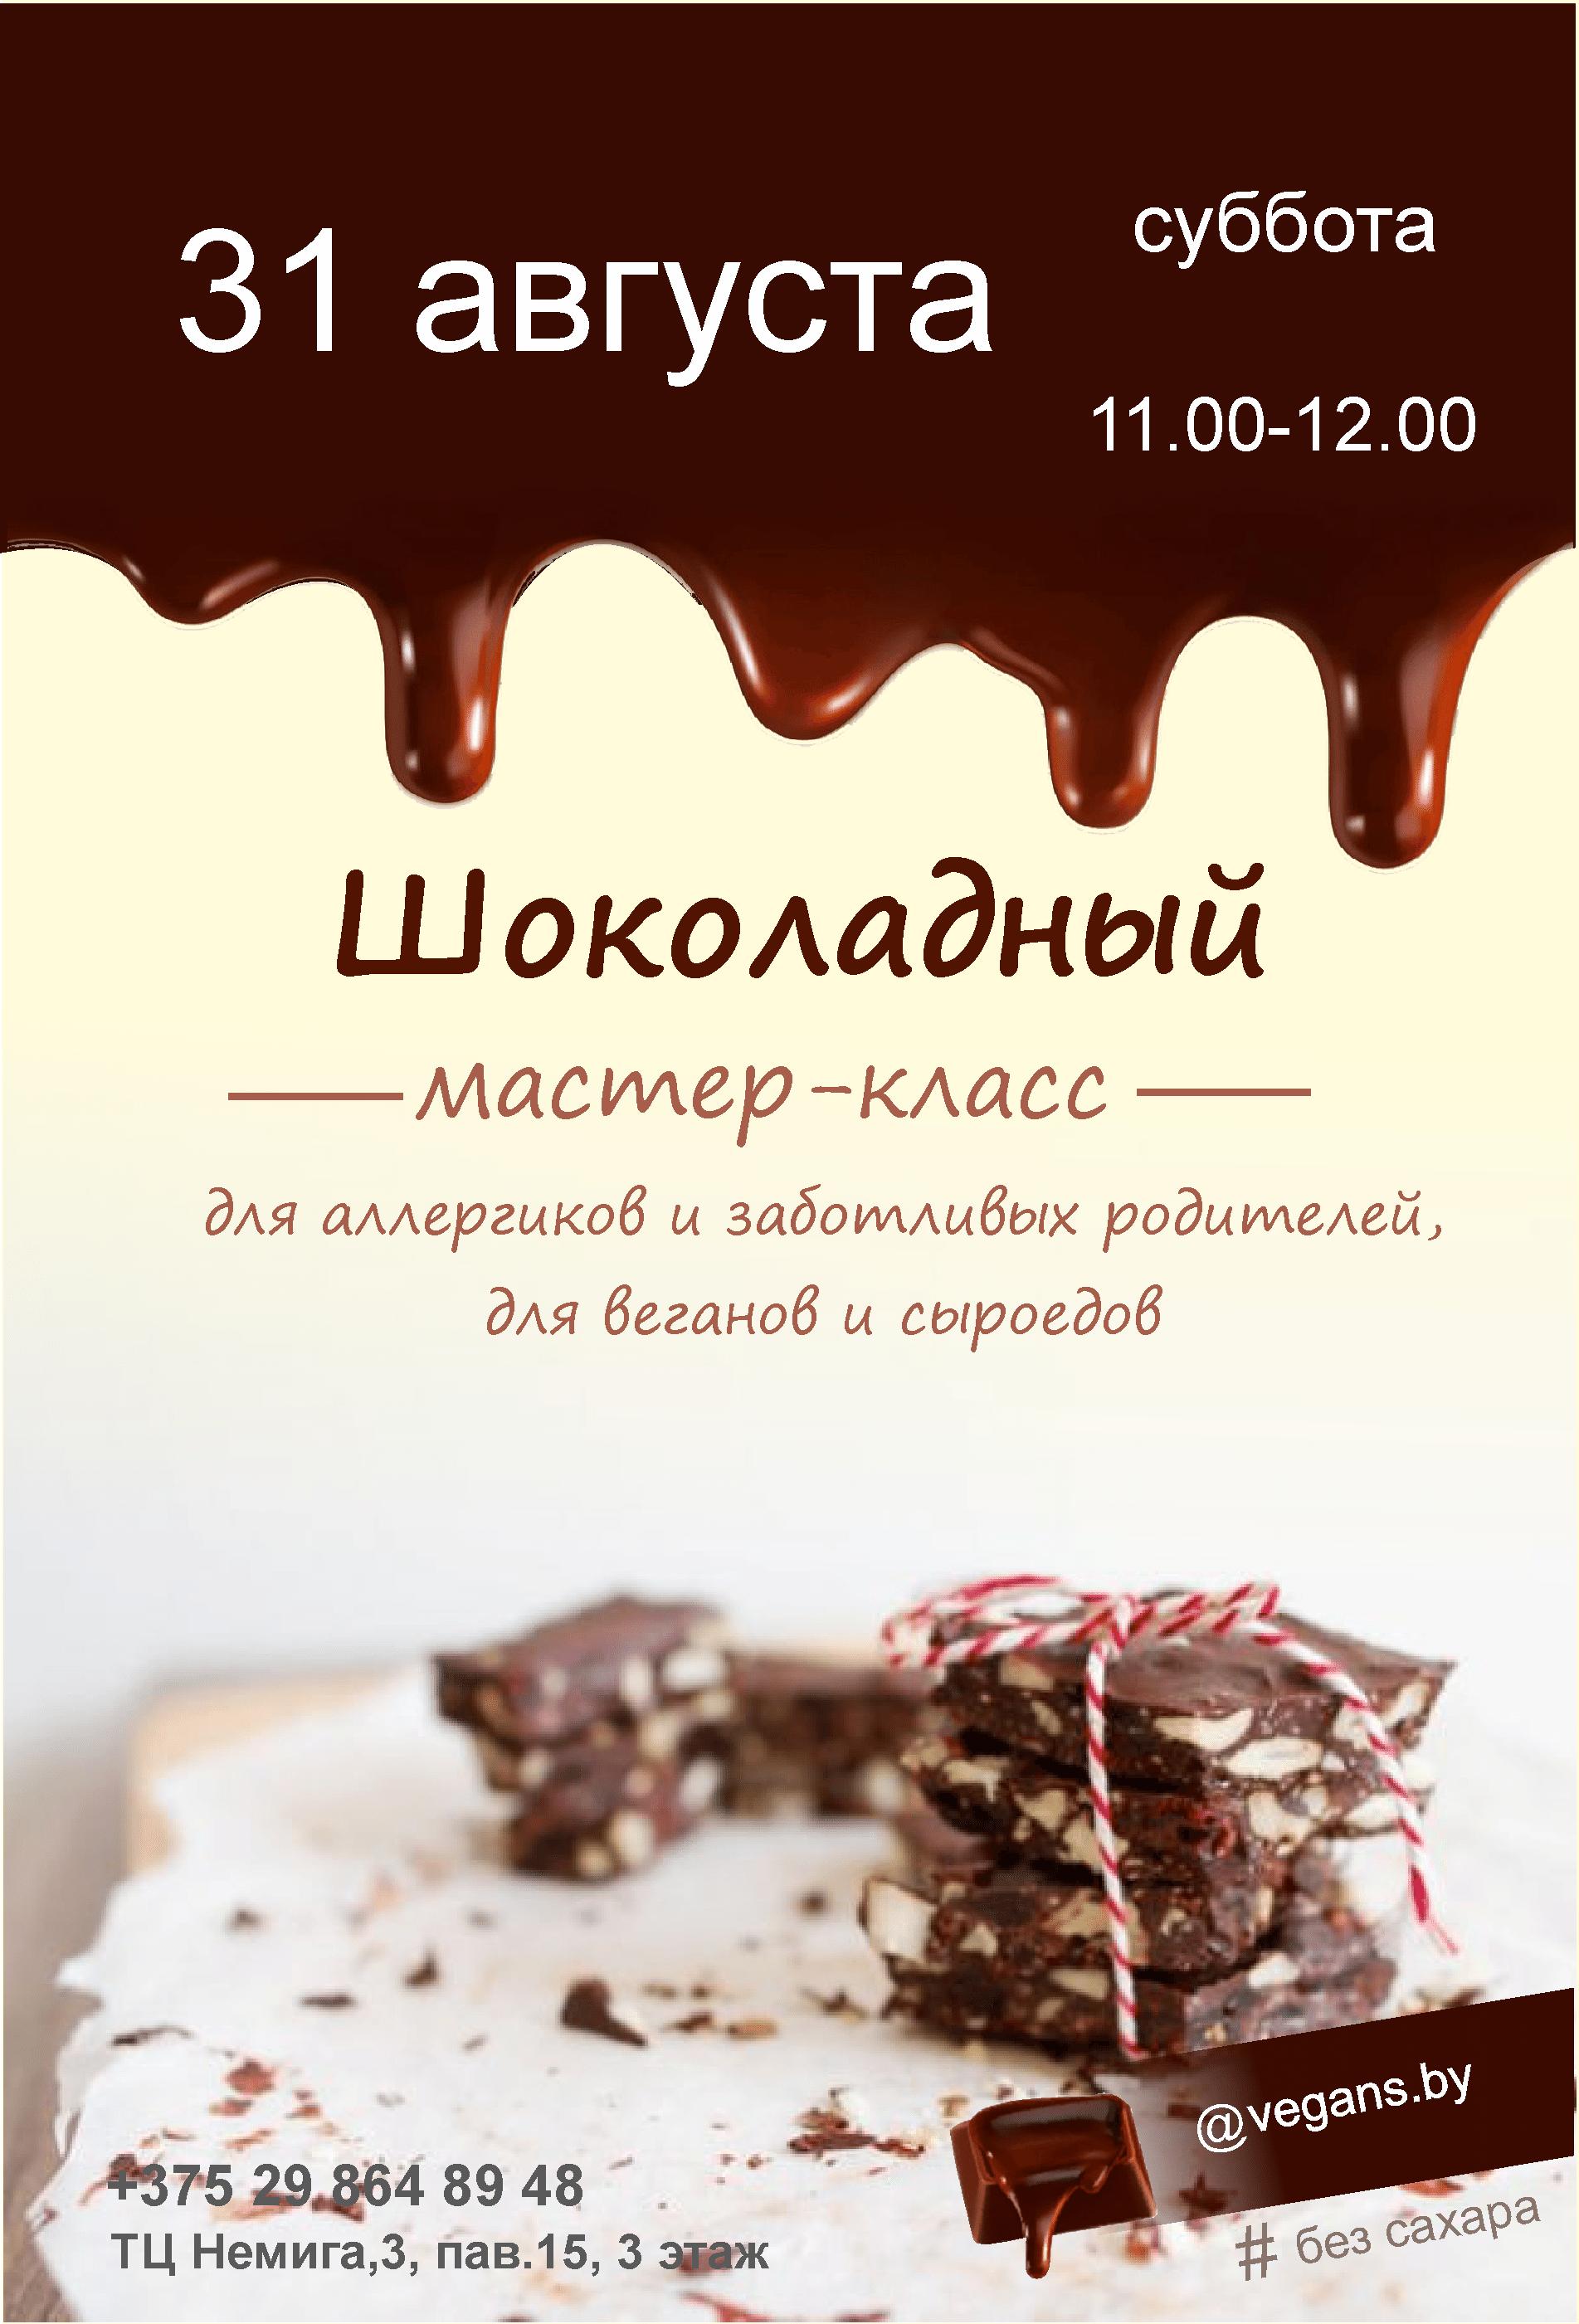 МАСТЕР-КЛАСС В МИНСКЕ